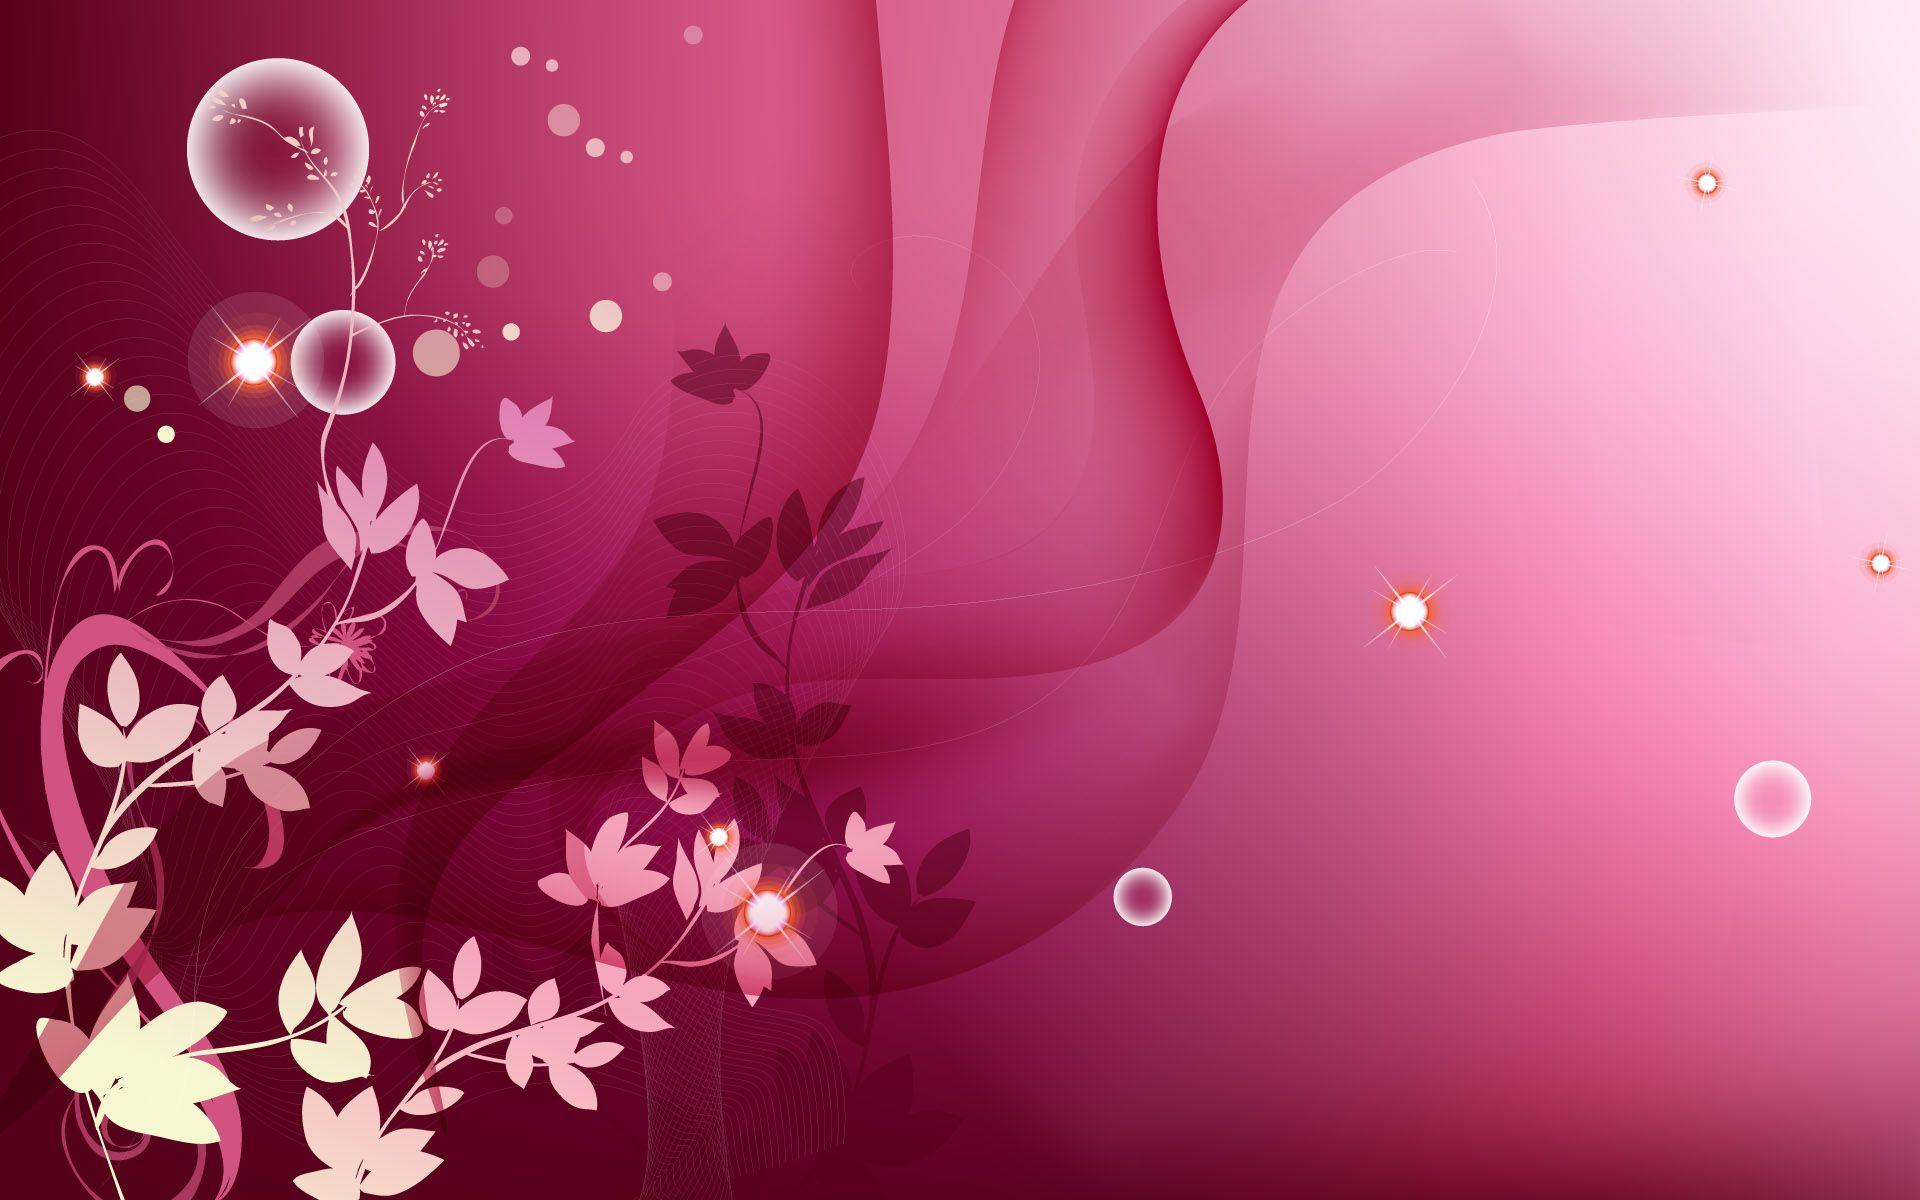 hd cute pink butterfly - photo #40